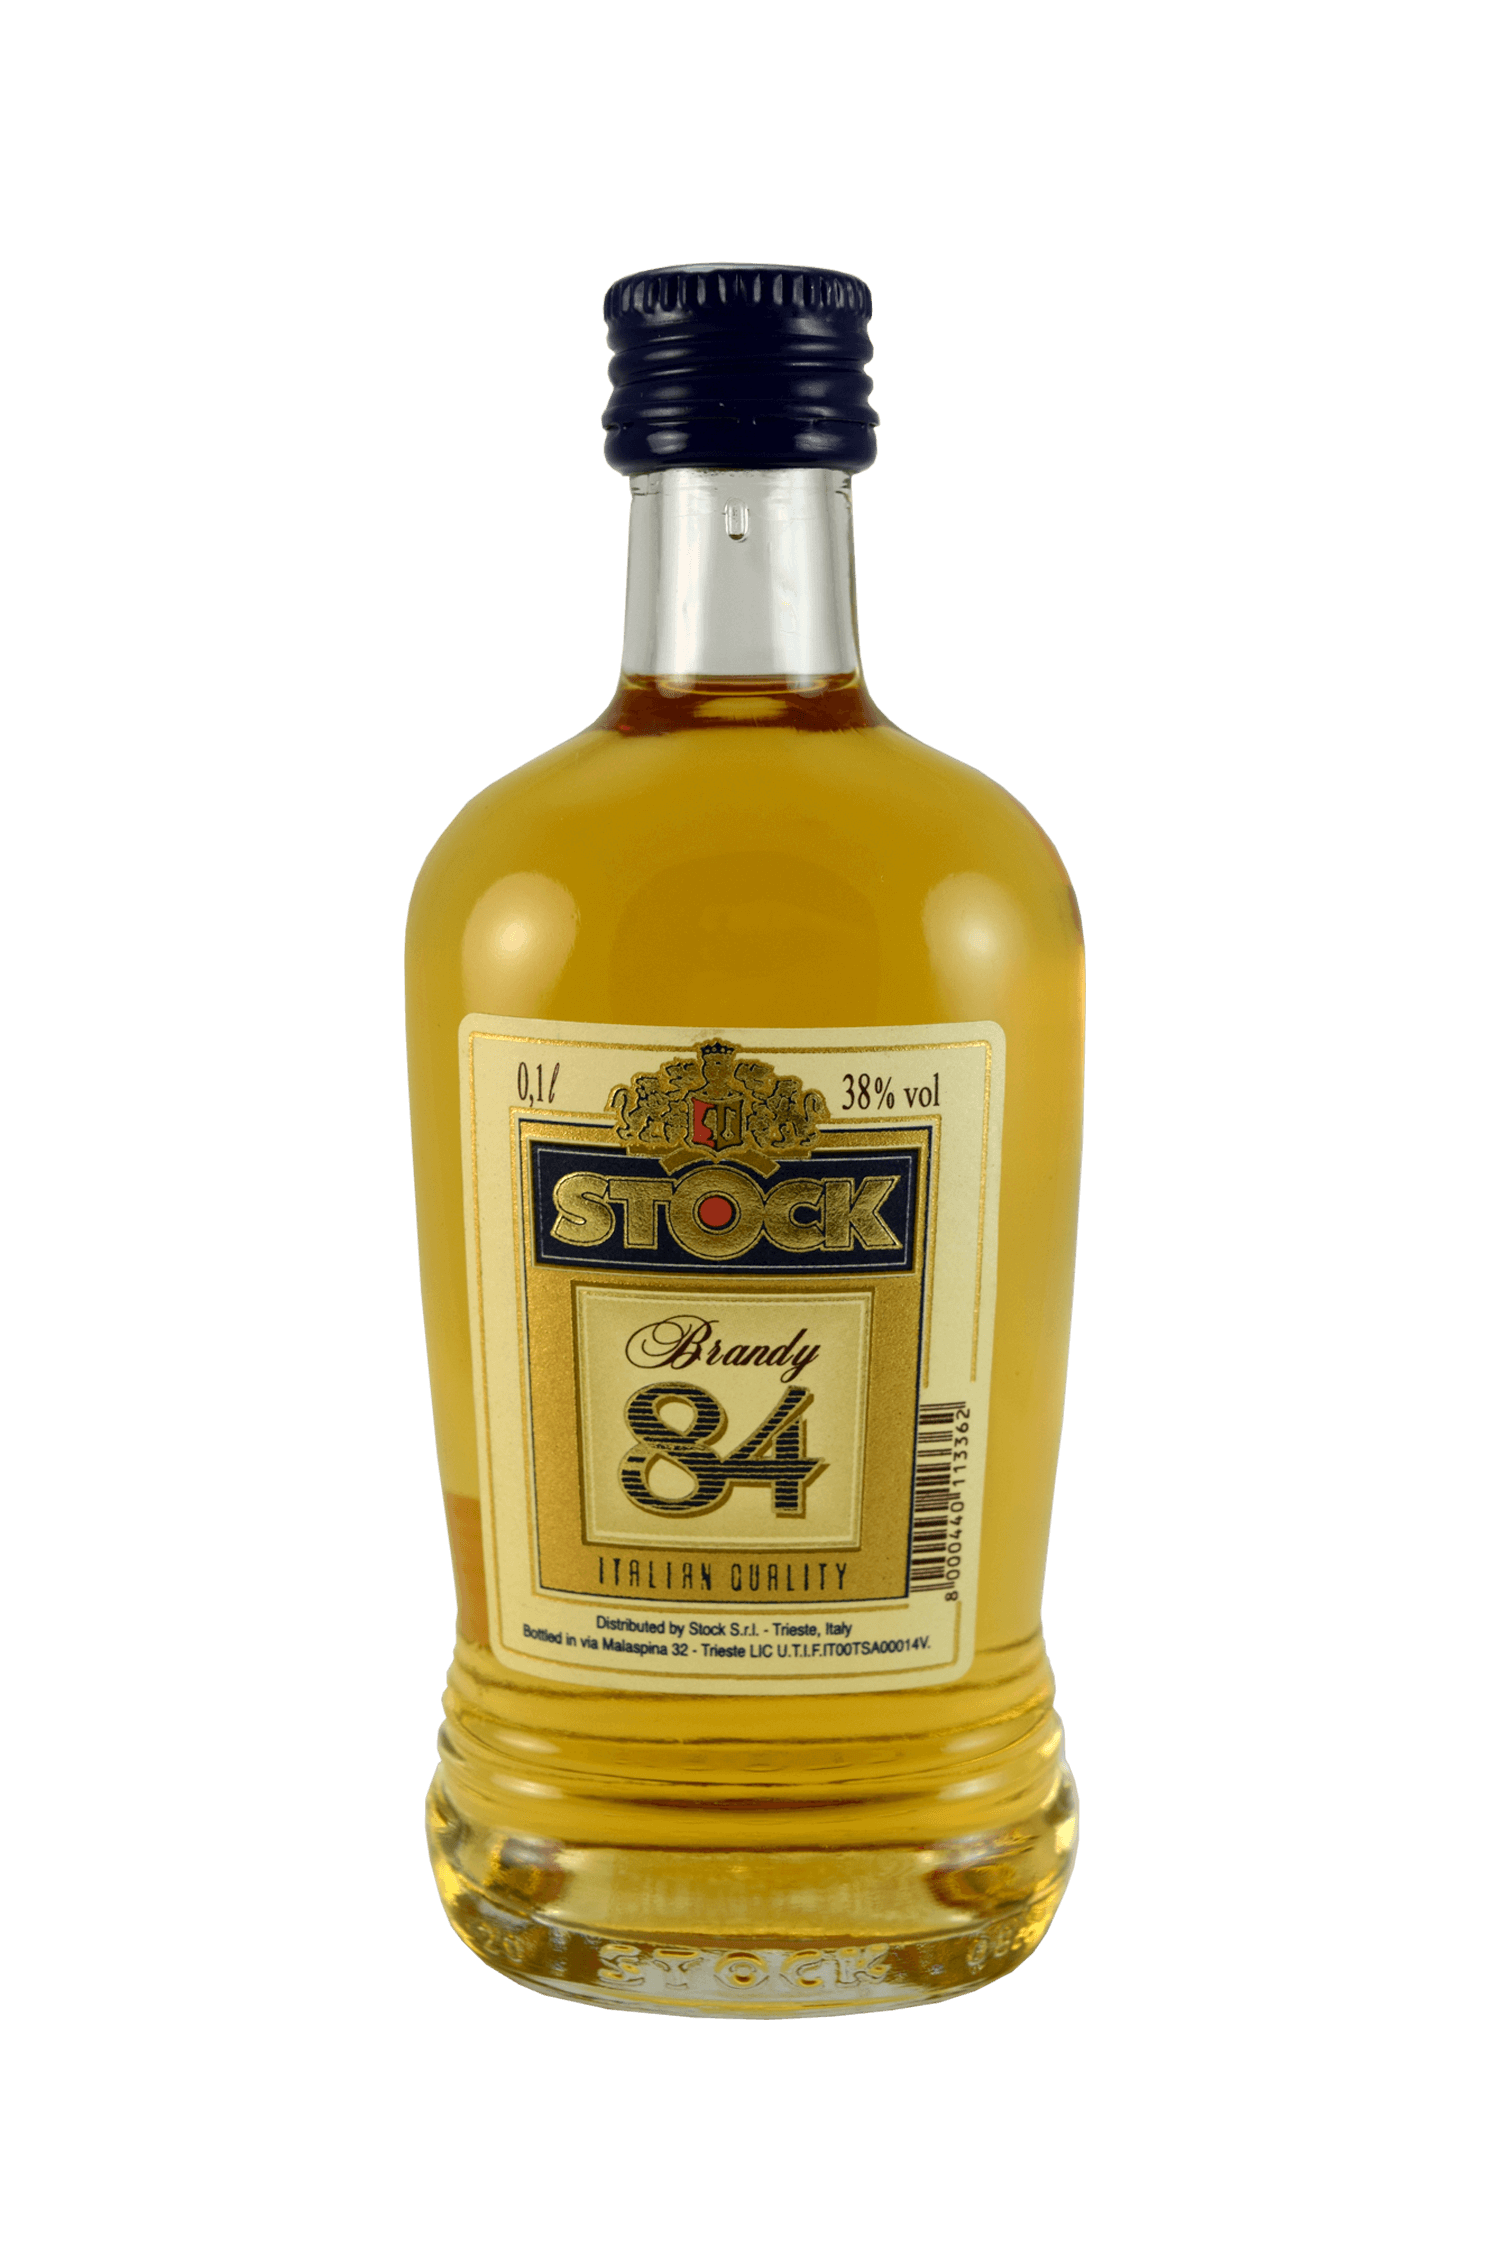 Stock Brandy 84